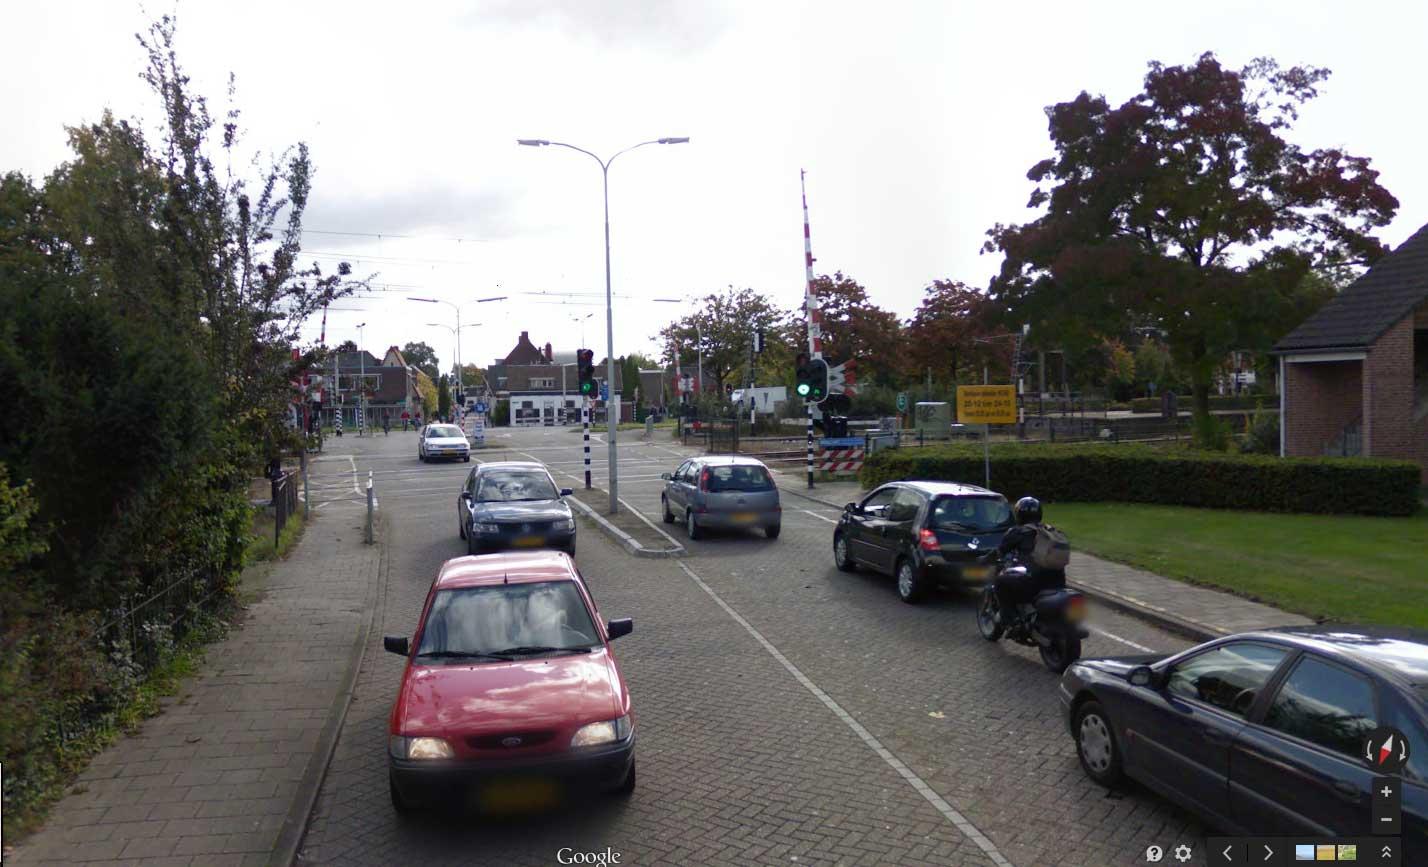 wilhelminaweg